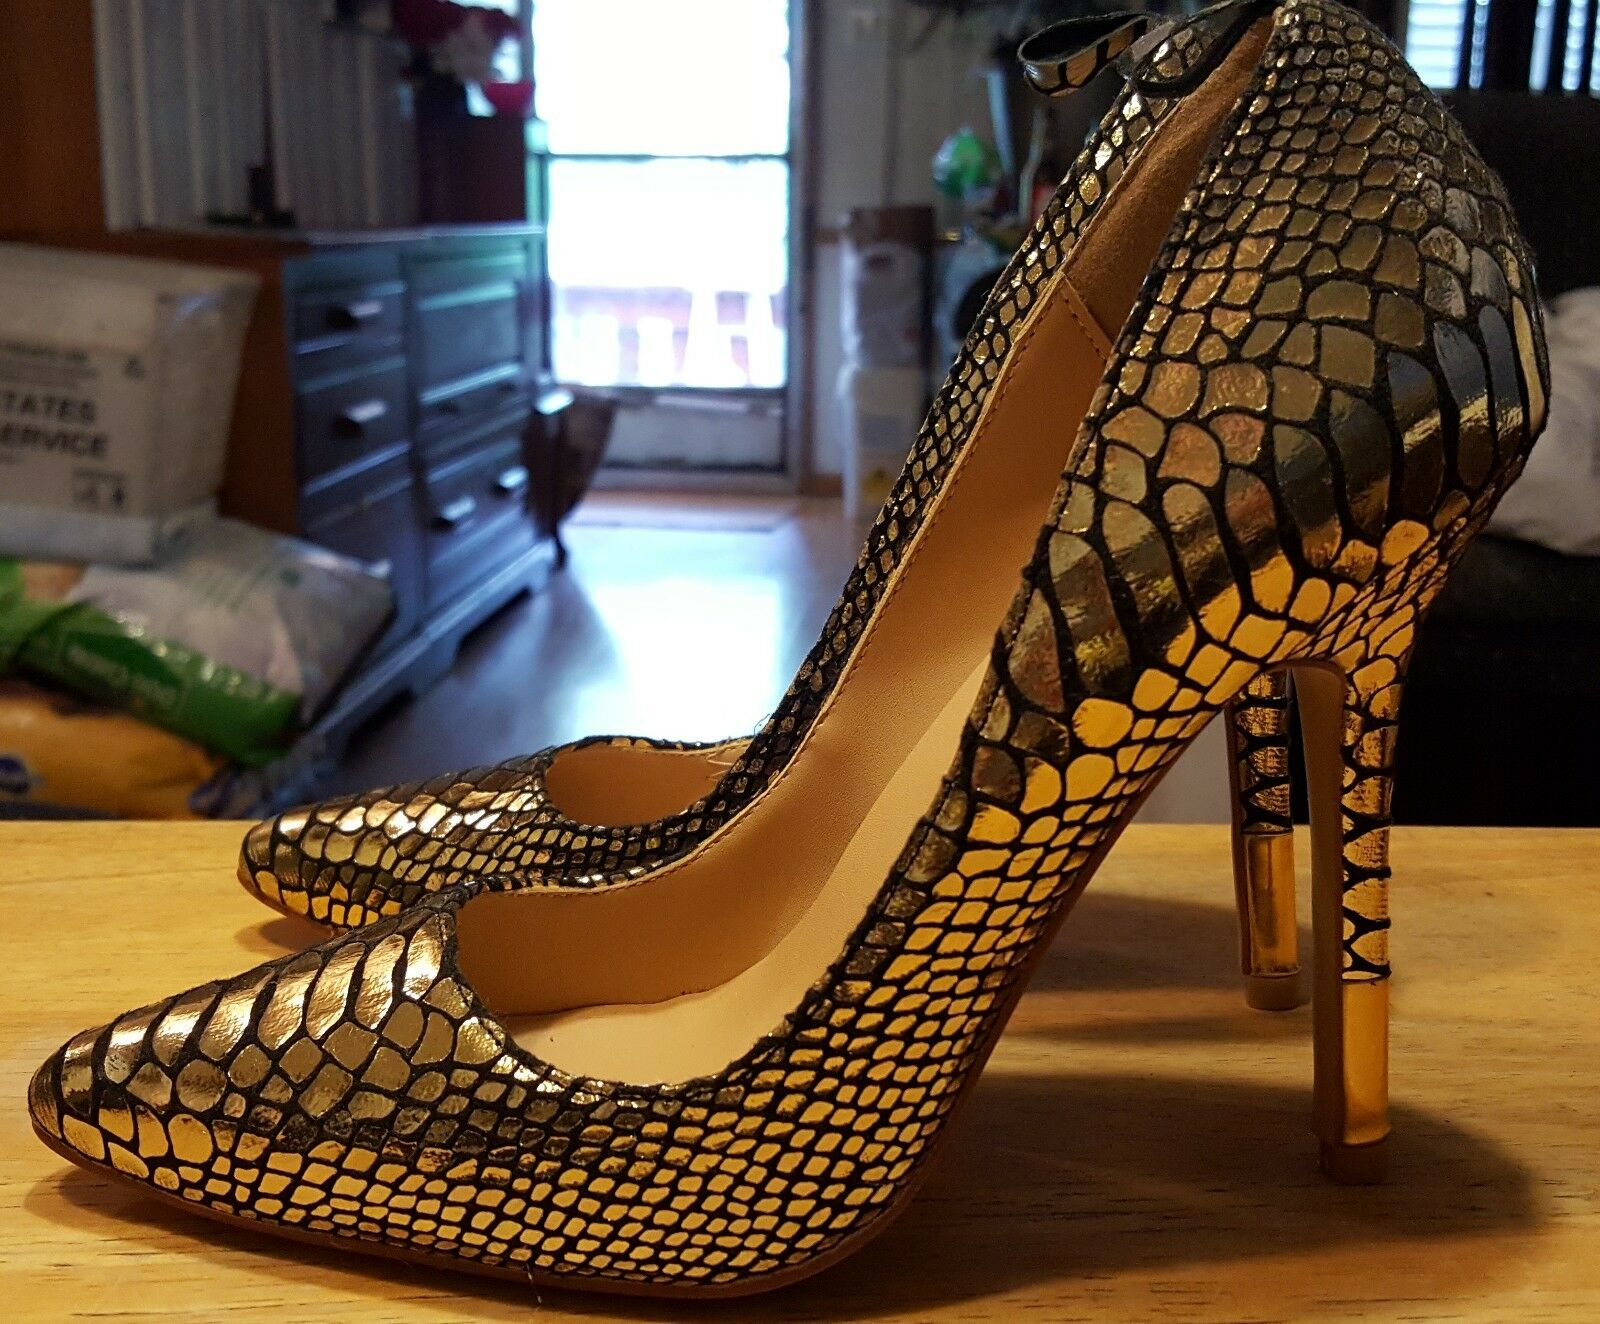 35ee1d3938314 Giuseppe Zanotti design heels ITALY gold alligator design design design size  (37)usa 6 1 2 74eb68